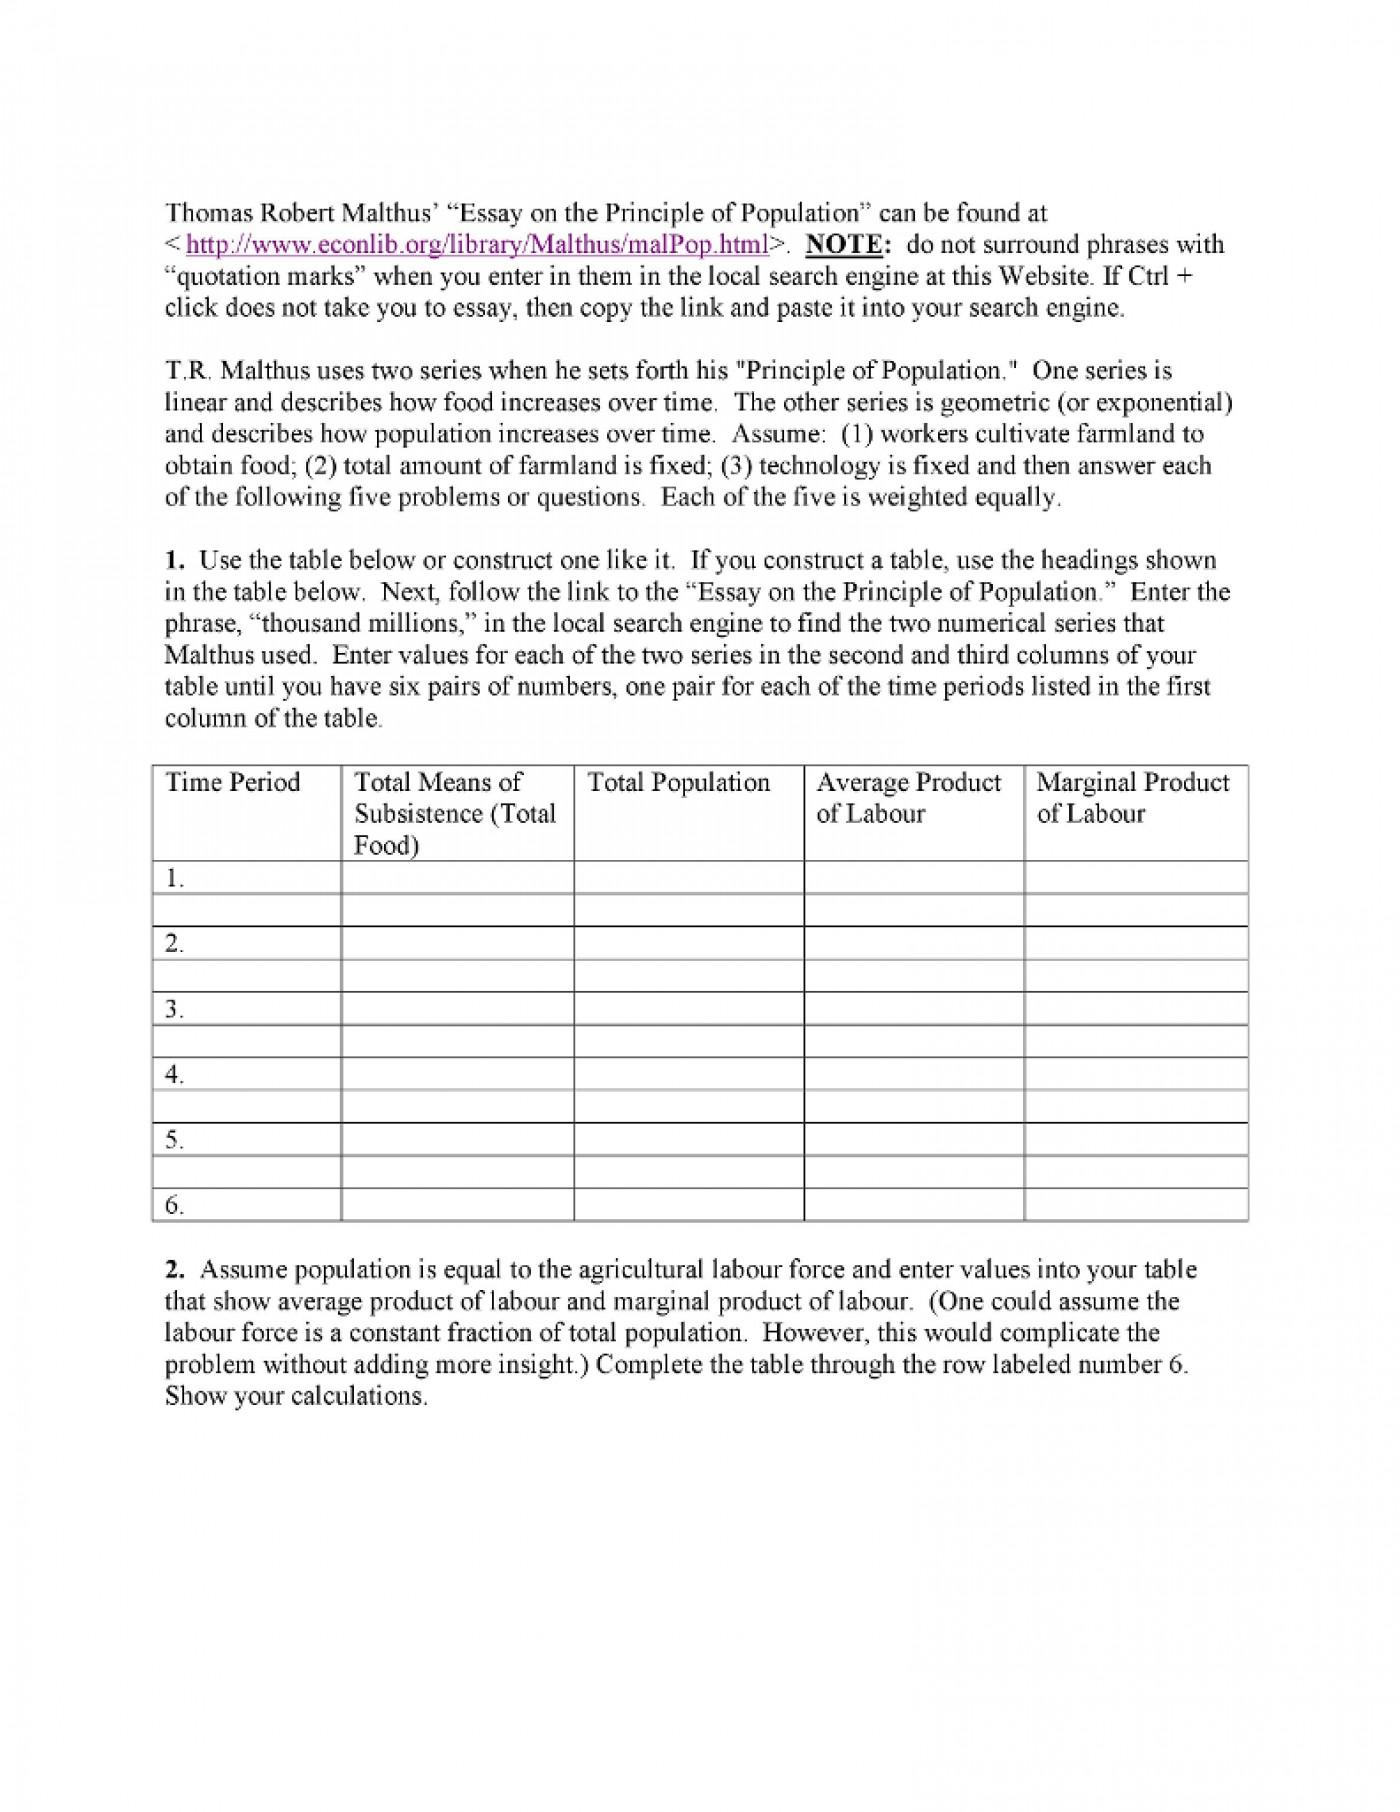 021 Media2fa542fa5470f48 198e7d7fbe4b2fphp607vam Essay On The Principle Of Population Singular Malthus Sparknotes Thomas Main Idea 1400